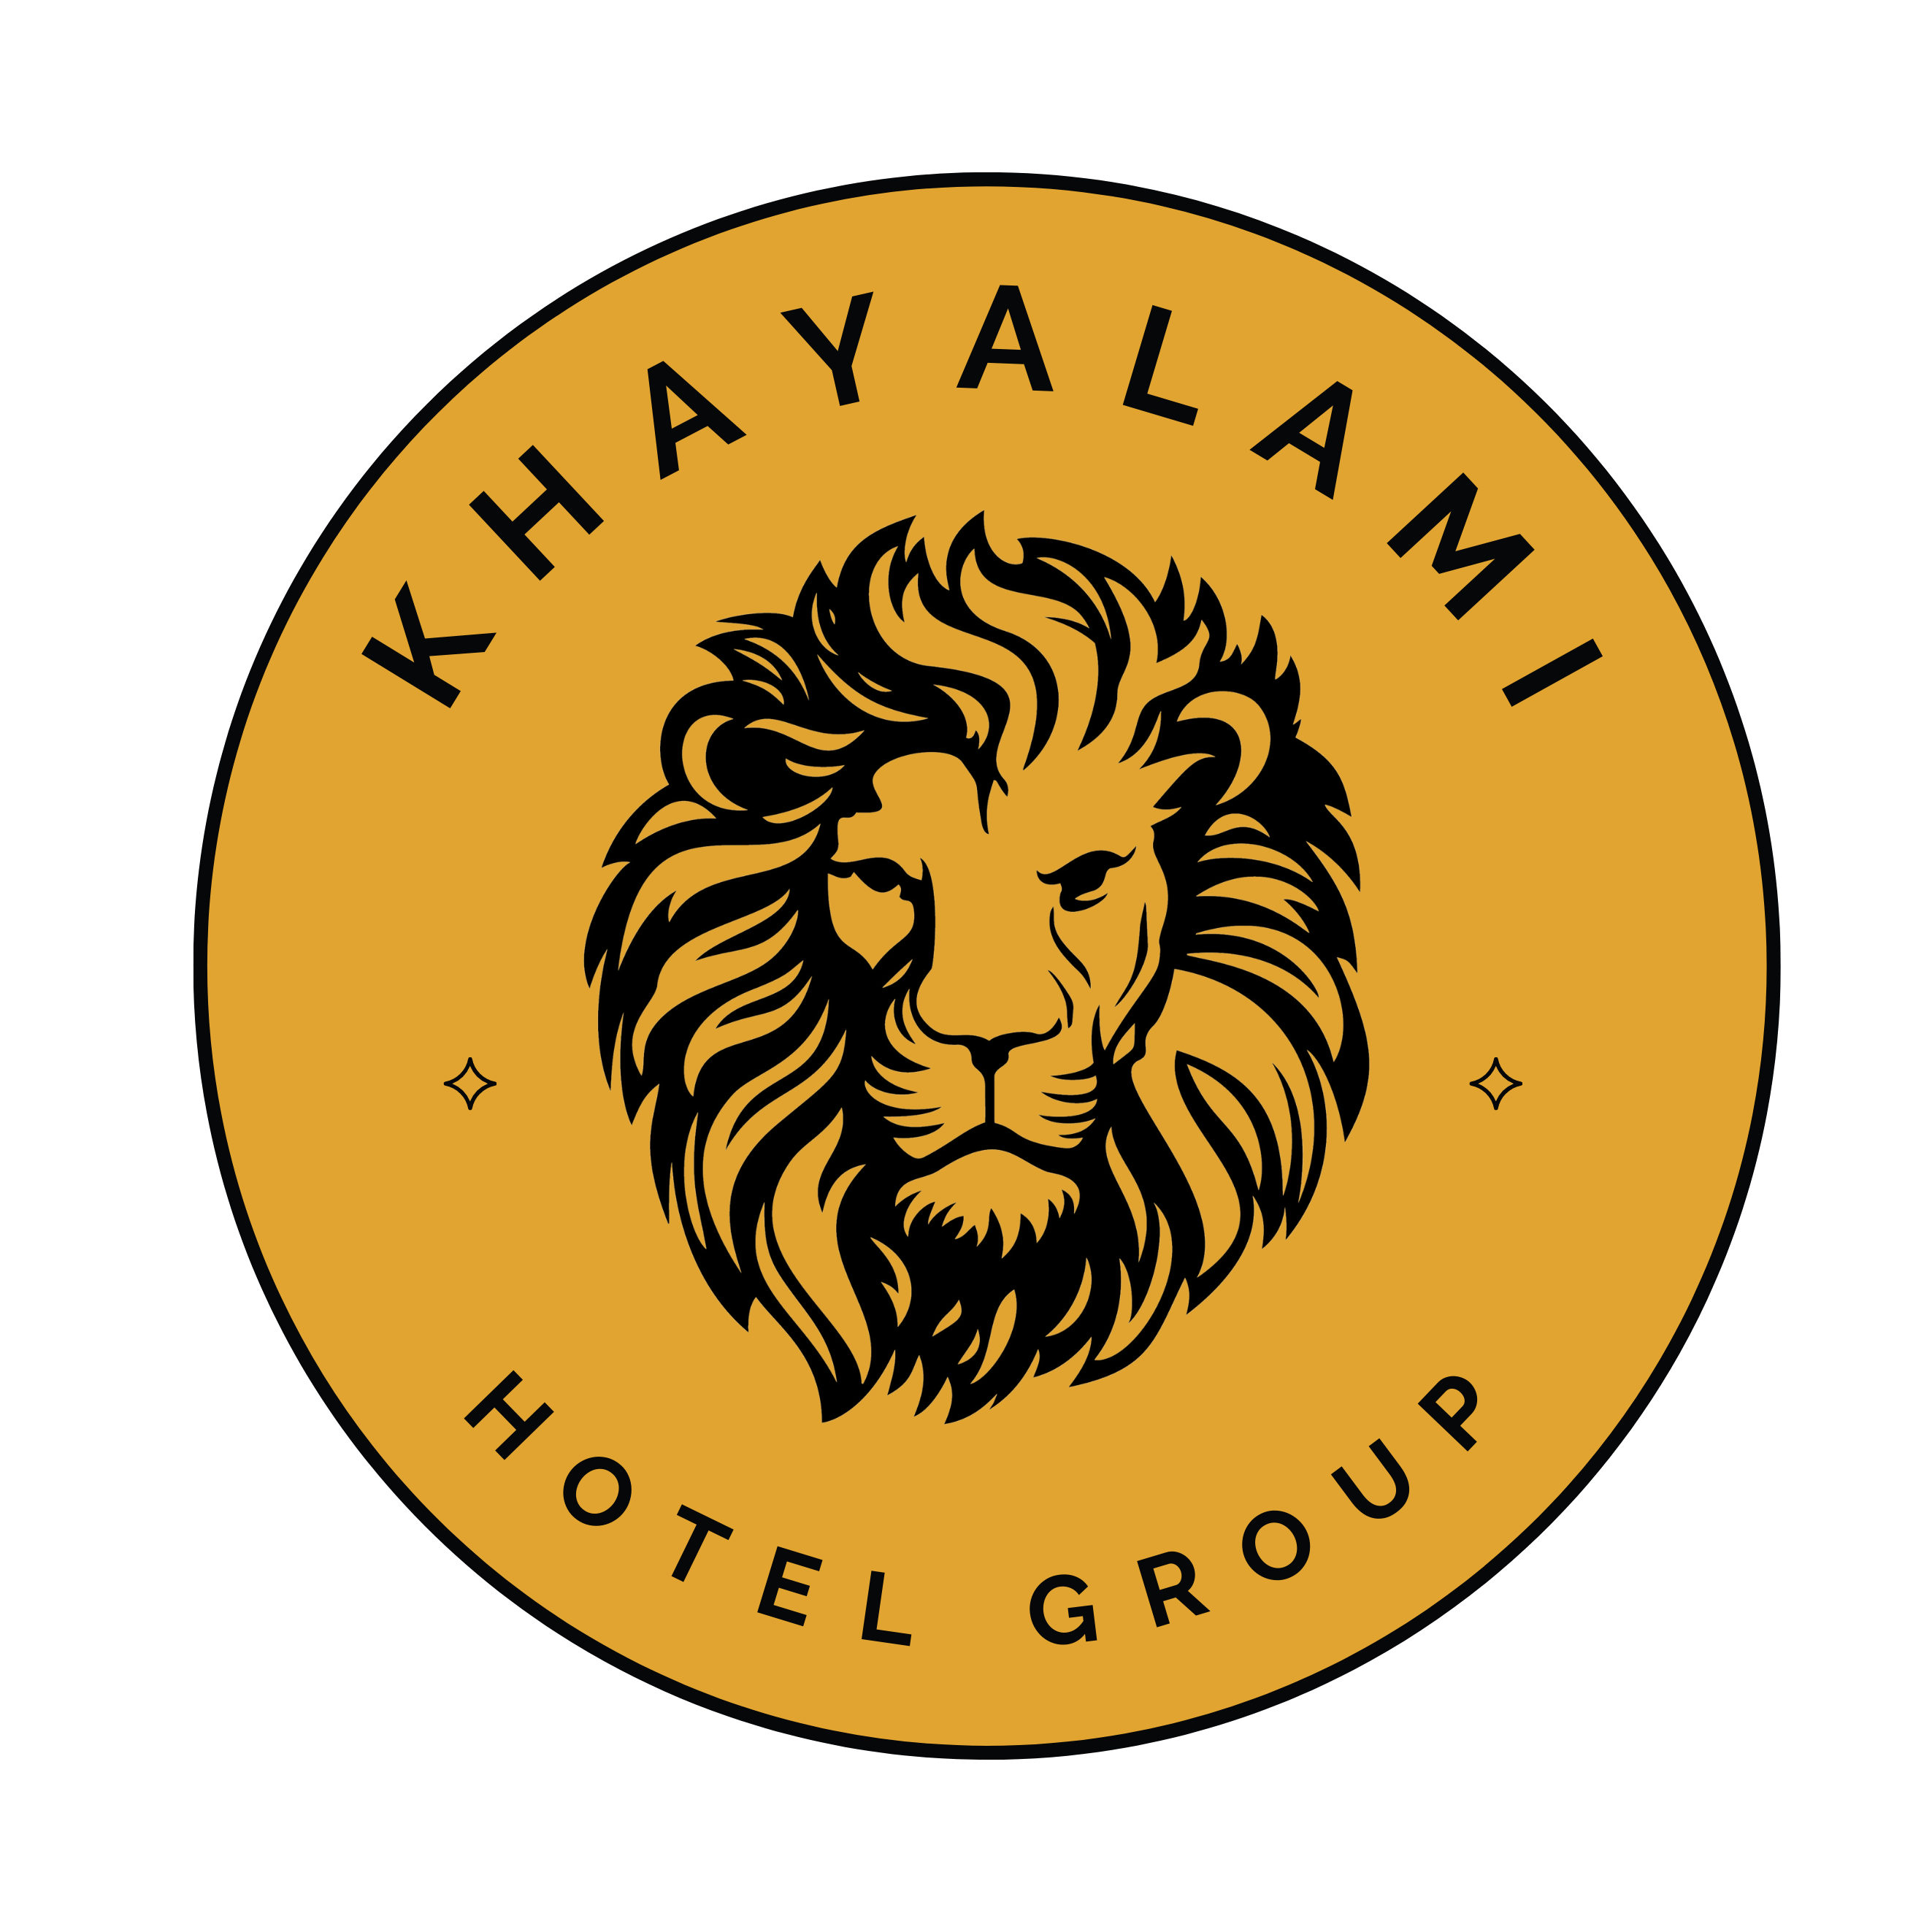 Khayalami Hotels